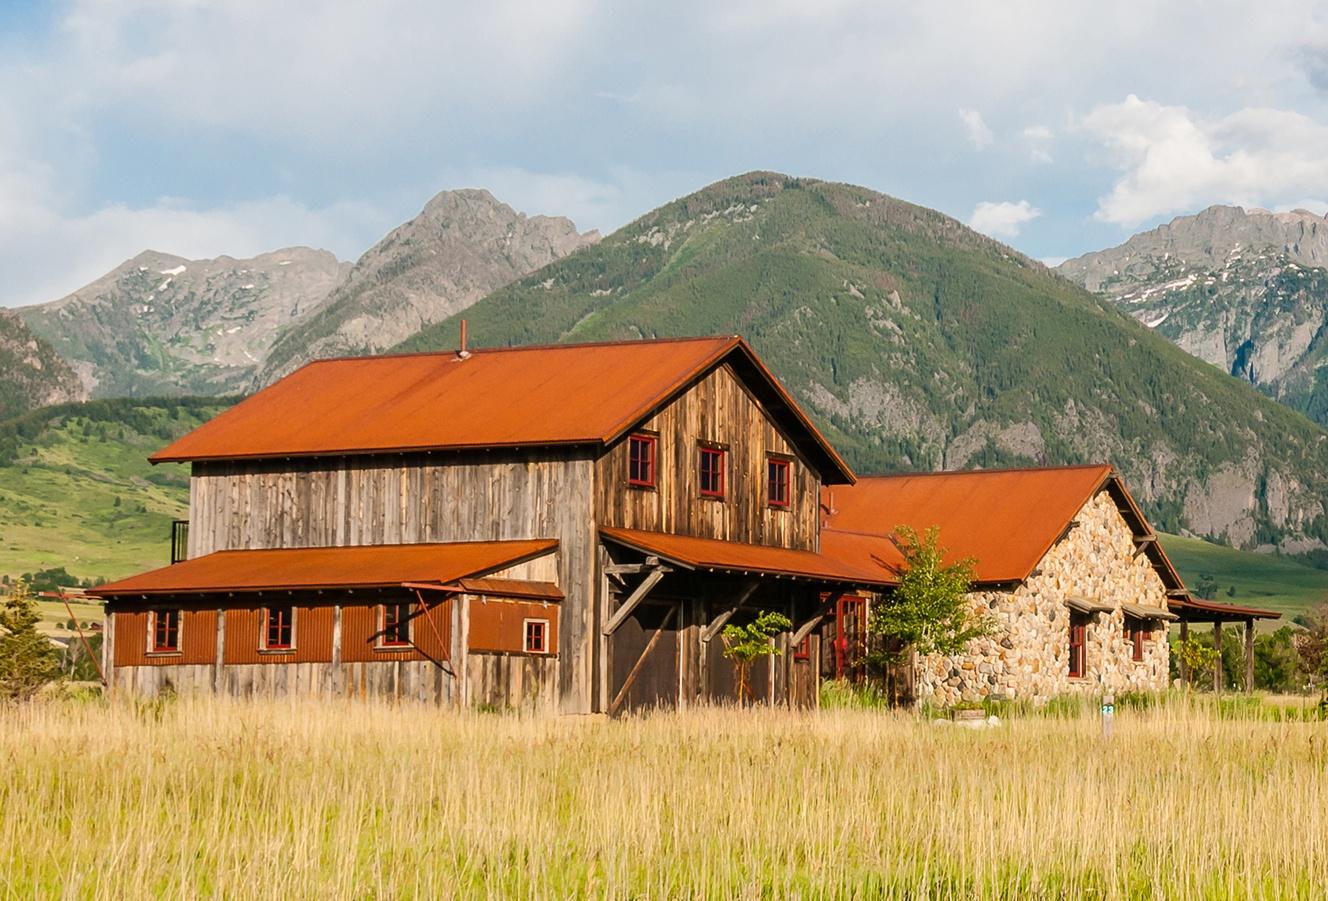 corrugated corten roofing